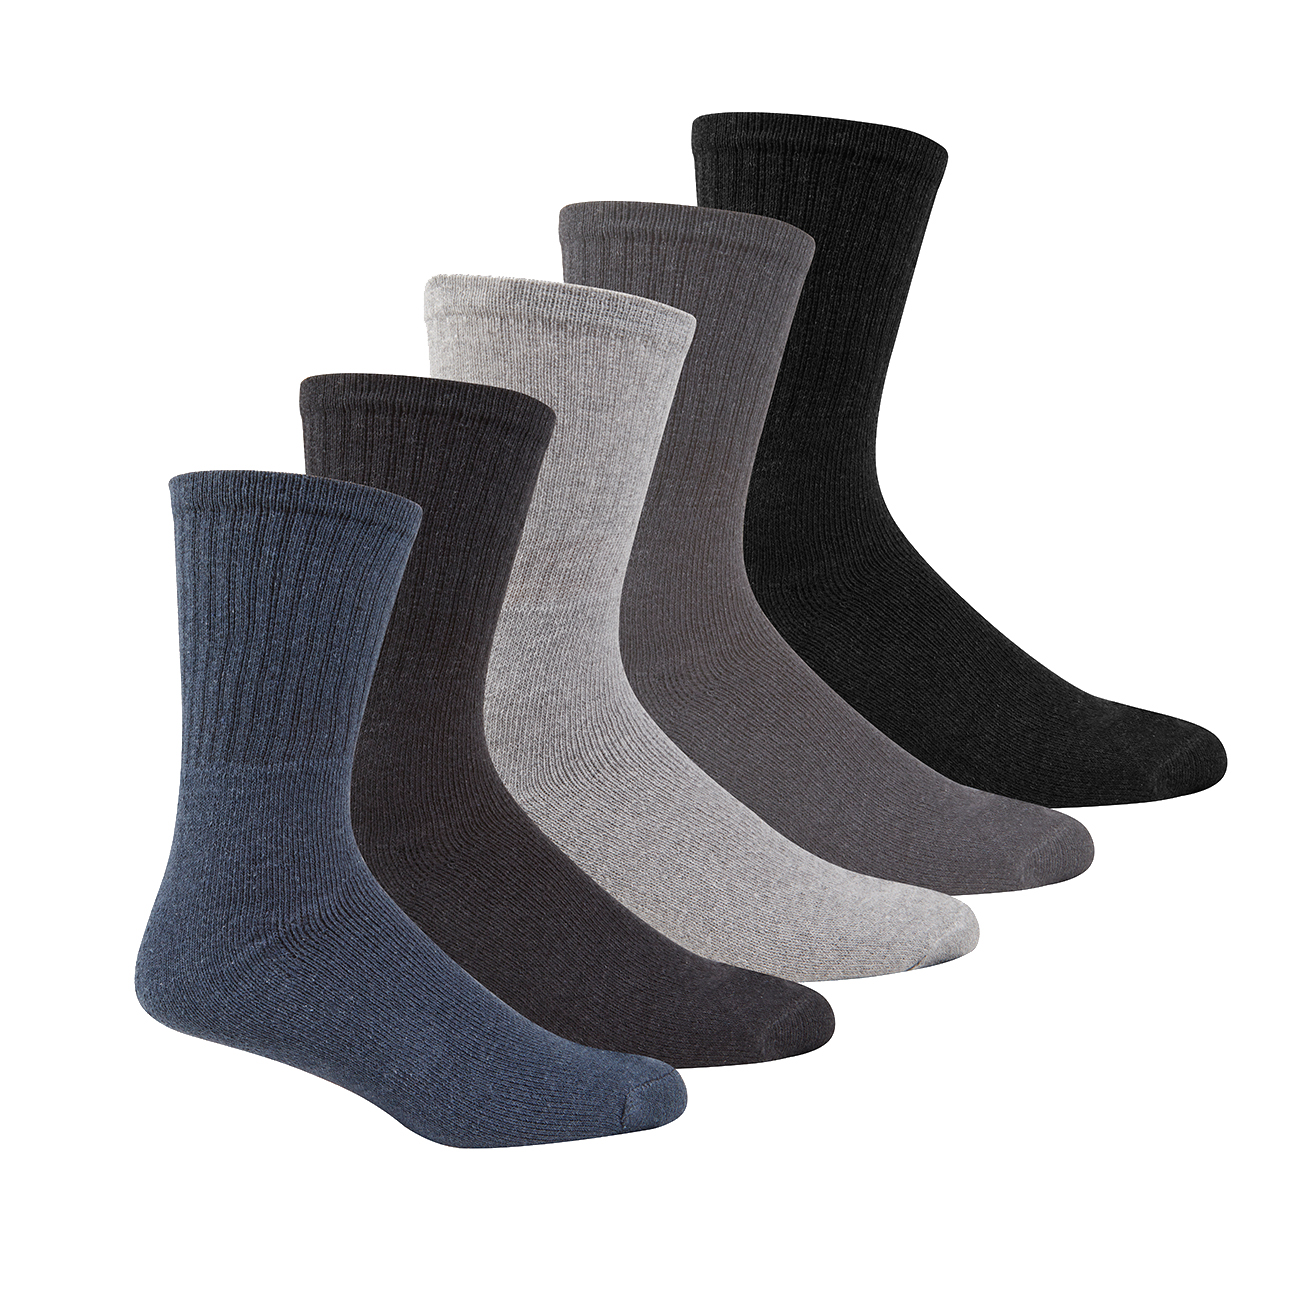 METZUYAN-Mens-10-Pairs-Sports-Socks-Cotton-Rich-Plain-Black-White-Grey-Size-6-11 miniatura 9